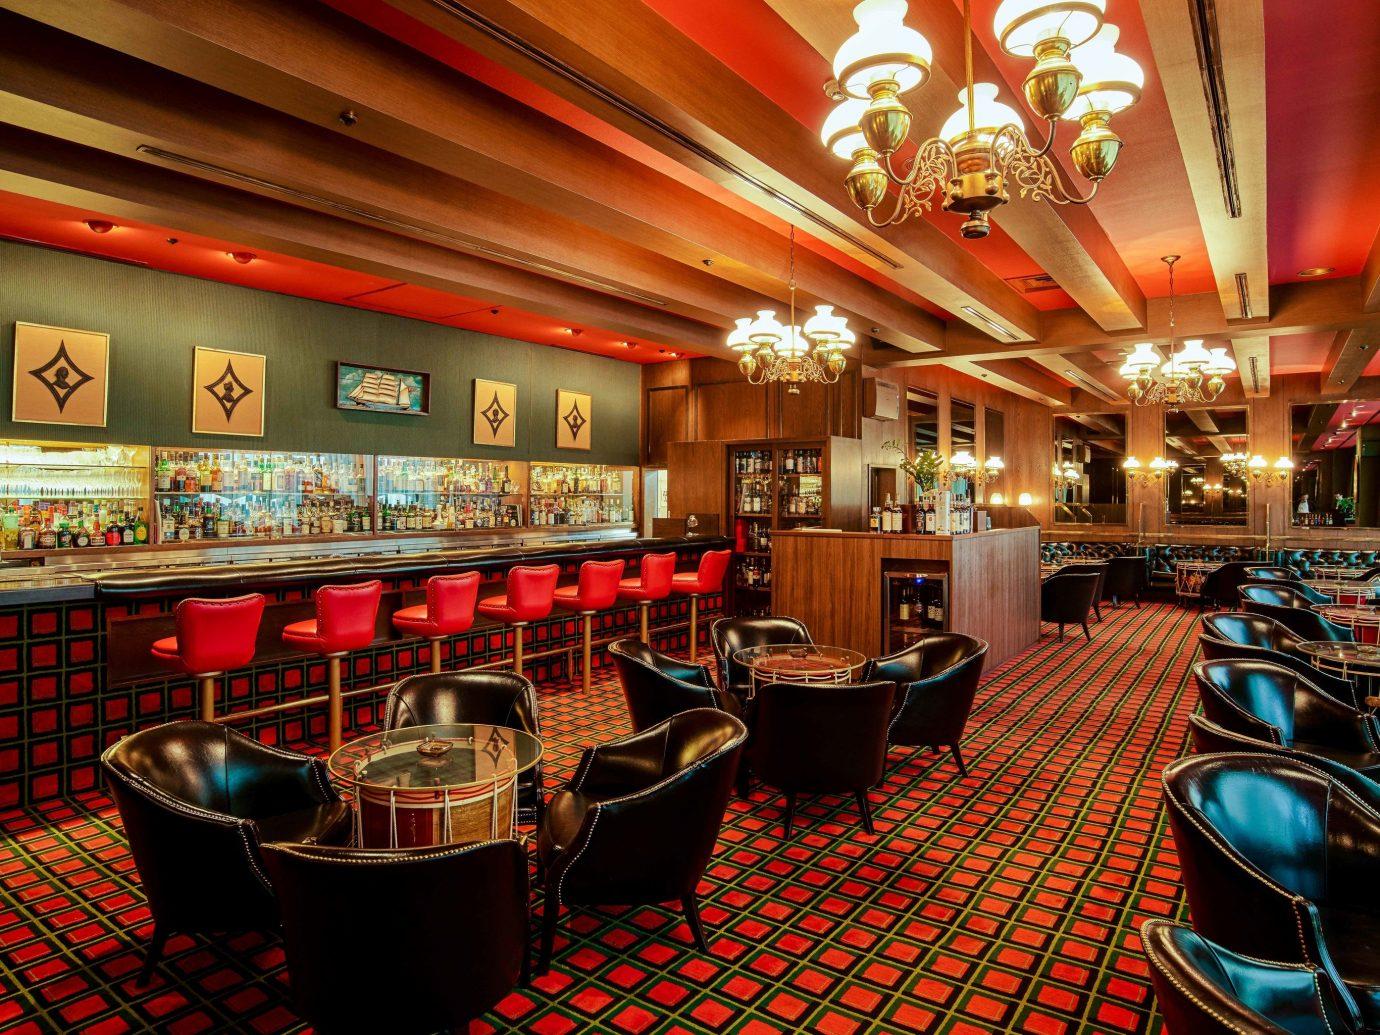 Trip Ideas indoor function hall restaurant ceiling interior design Casino Bar café Lobby fast food restaurant furniture several